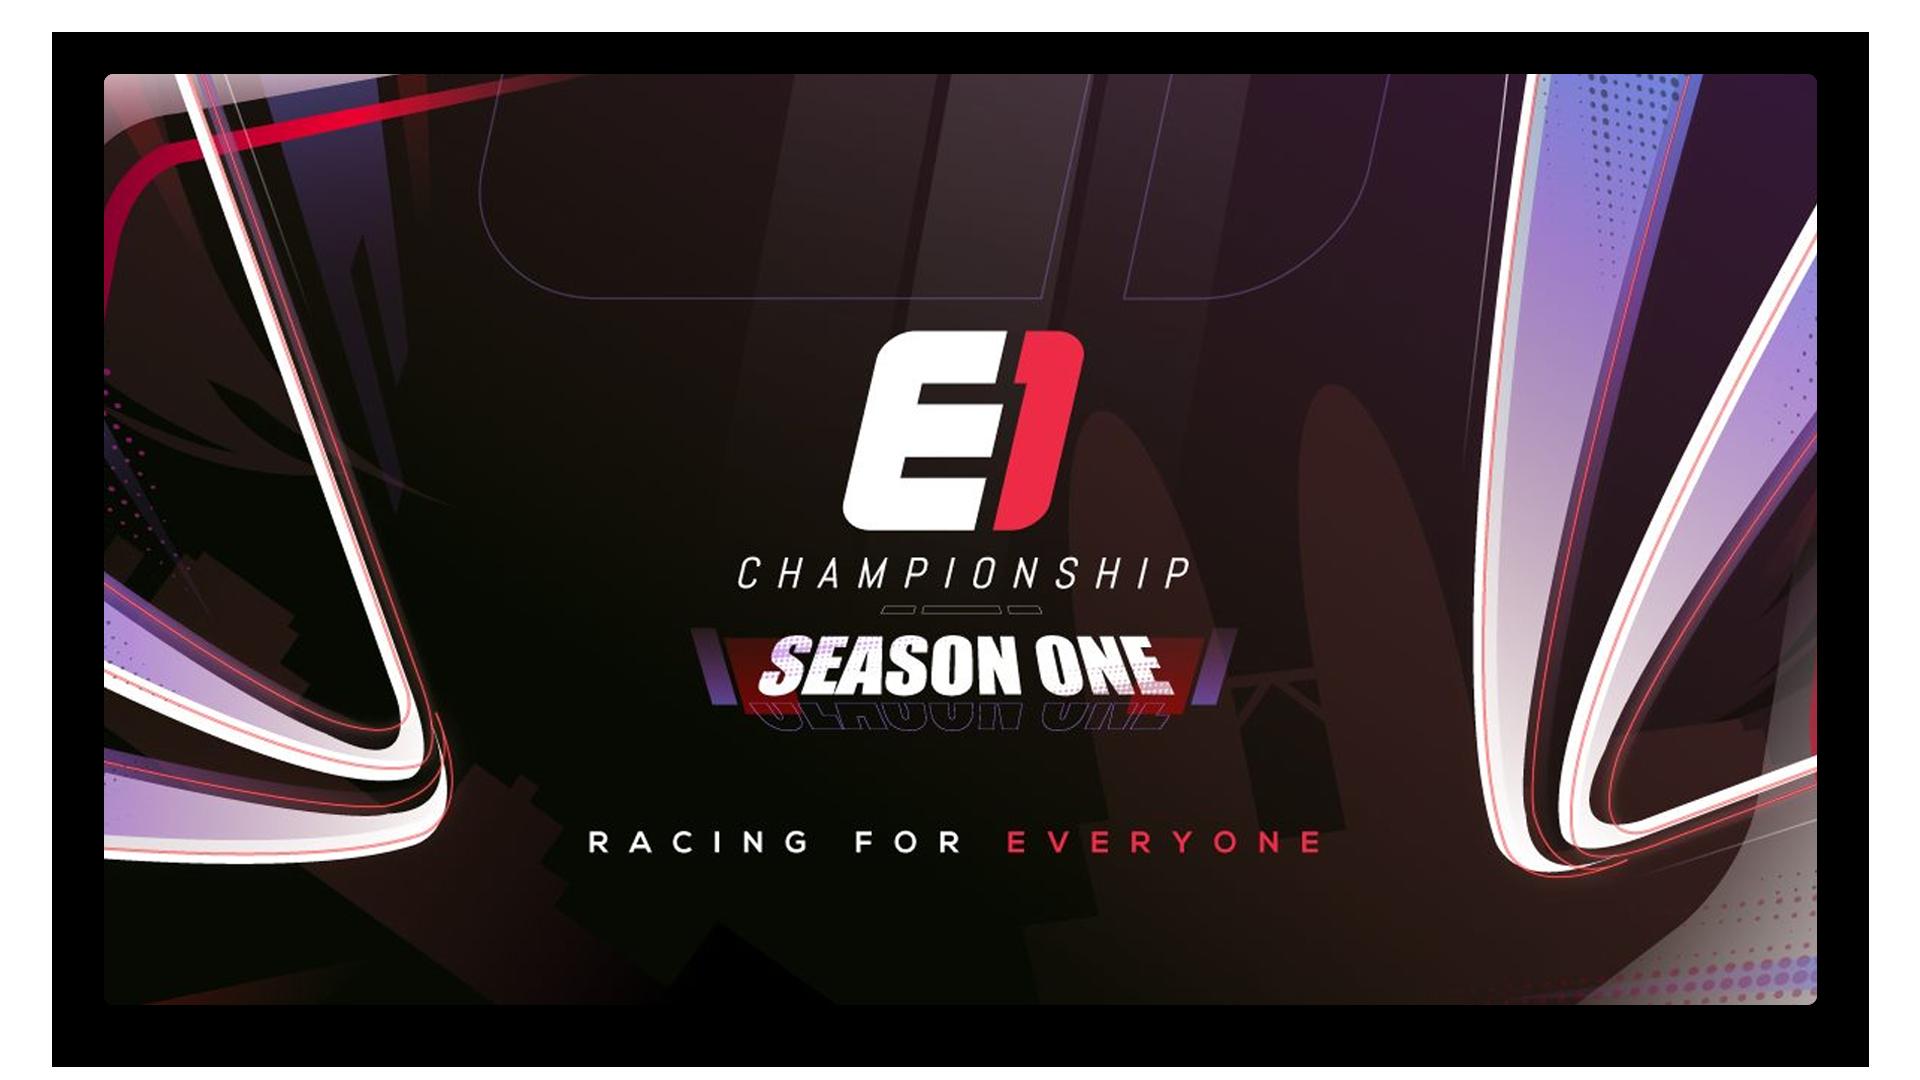 E1 Championship wallpaper